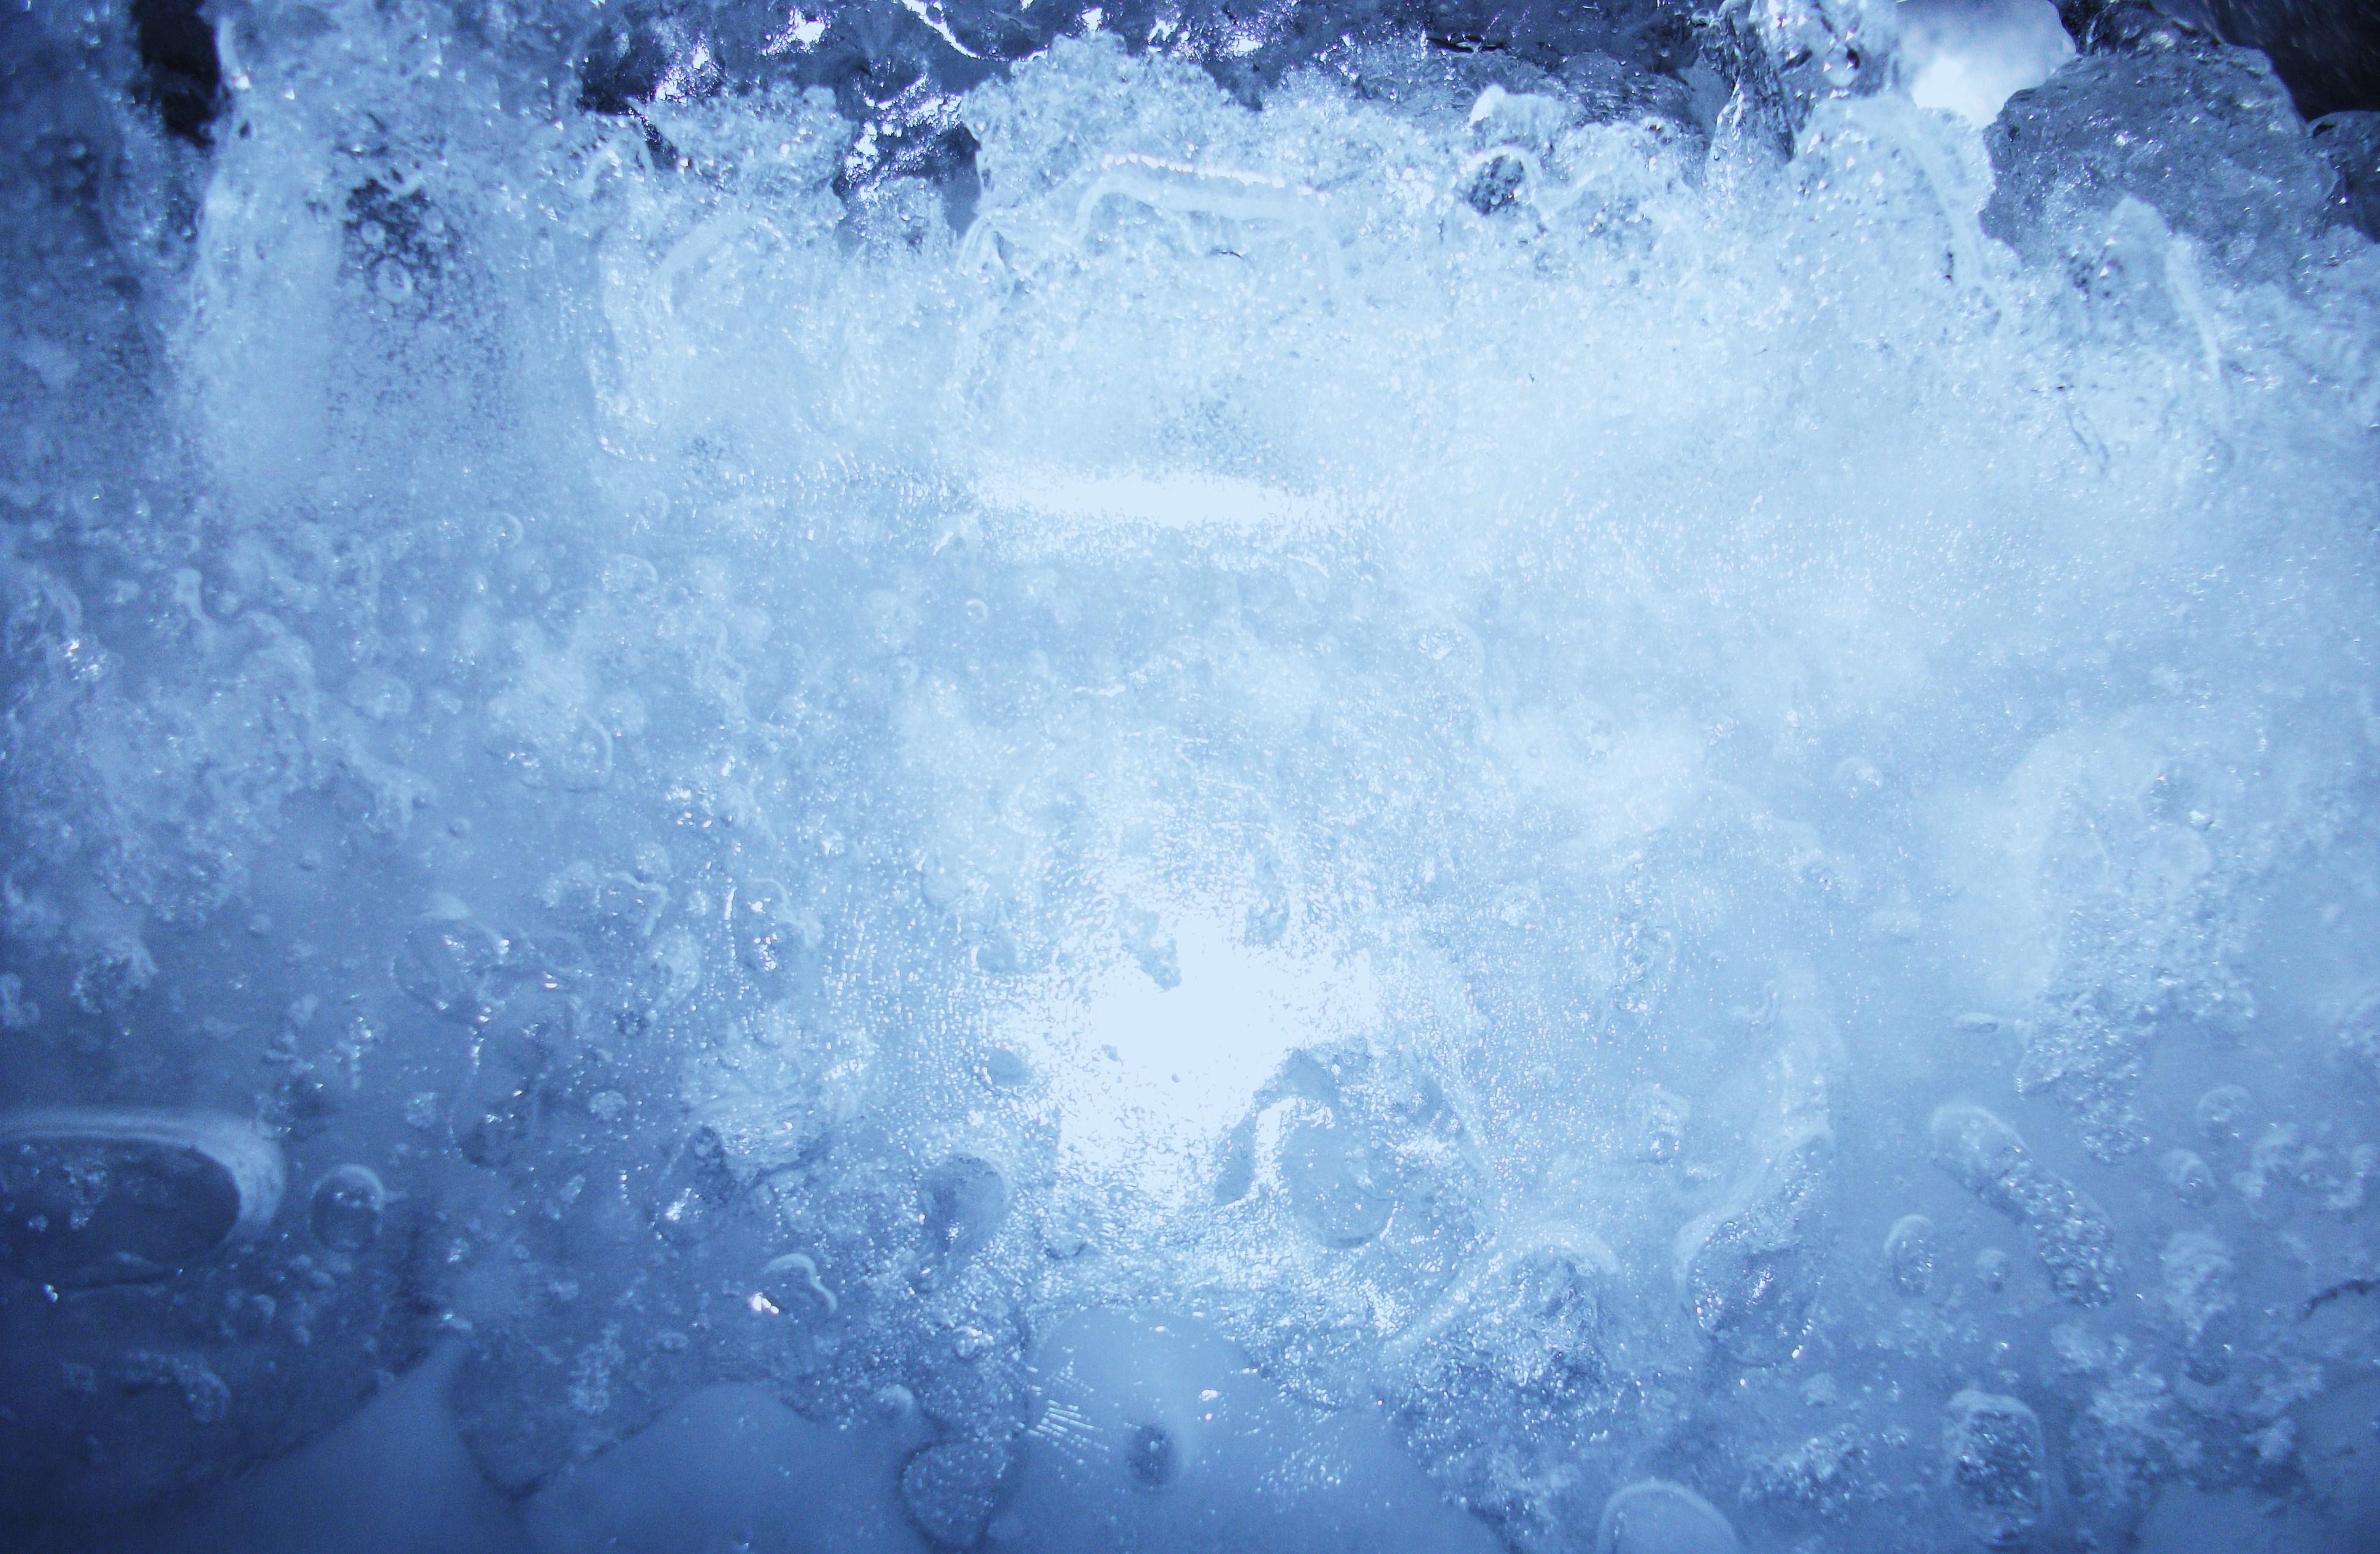 iced VI by Dan-Heffer